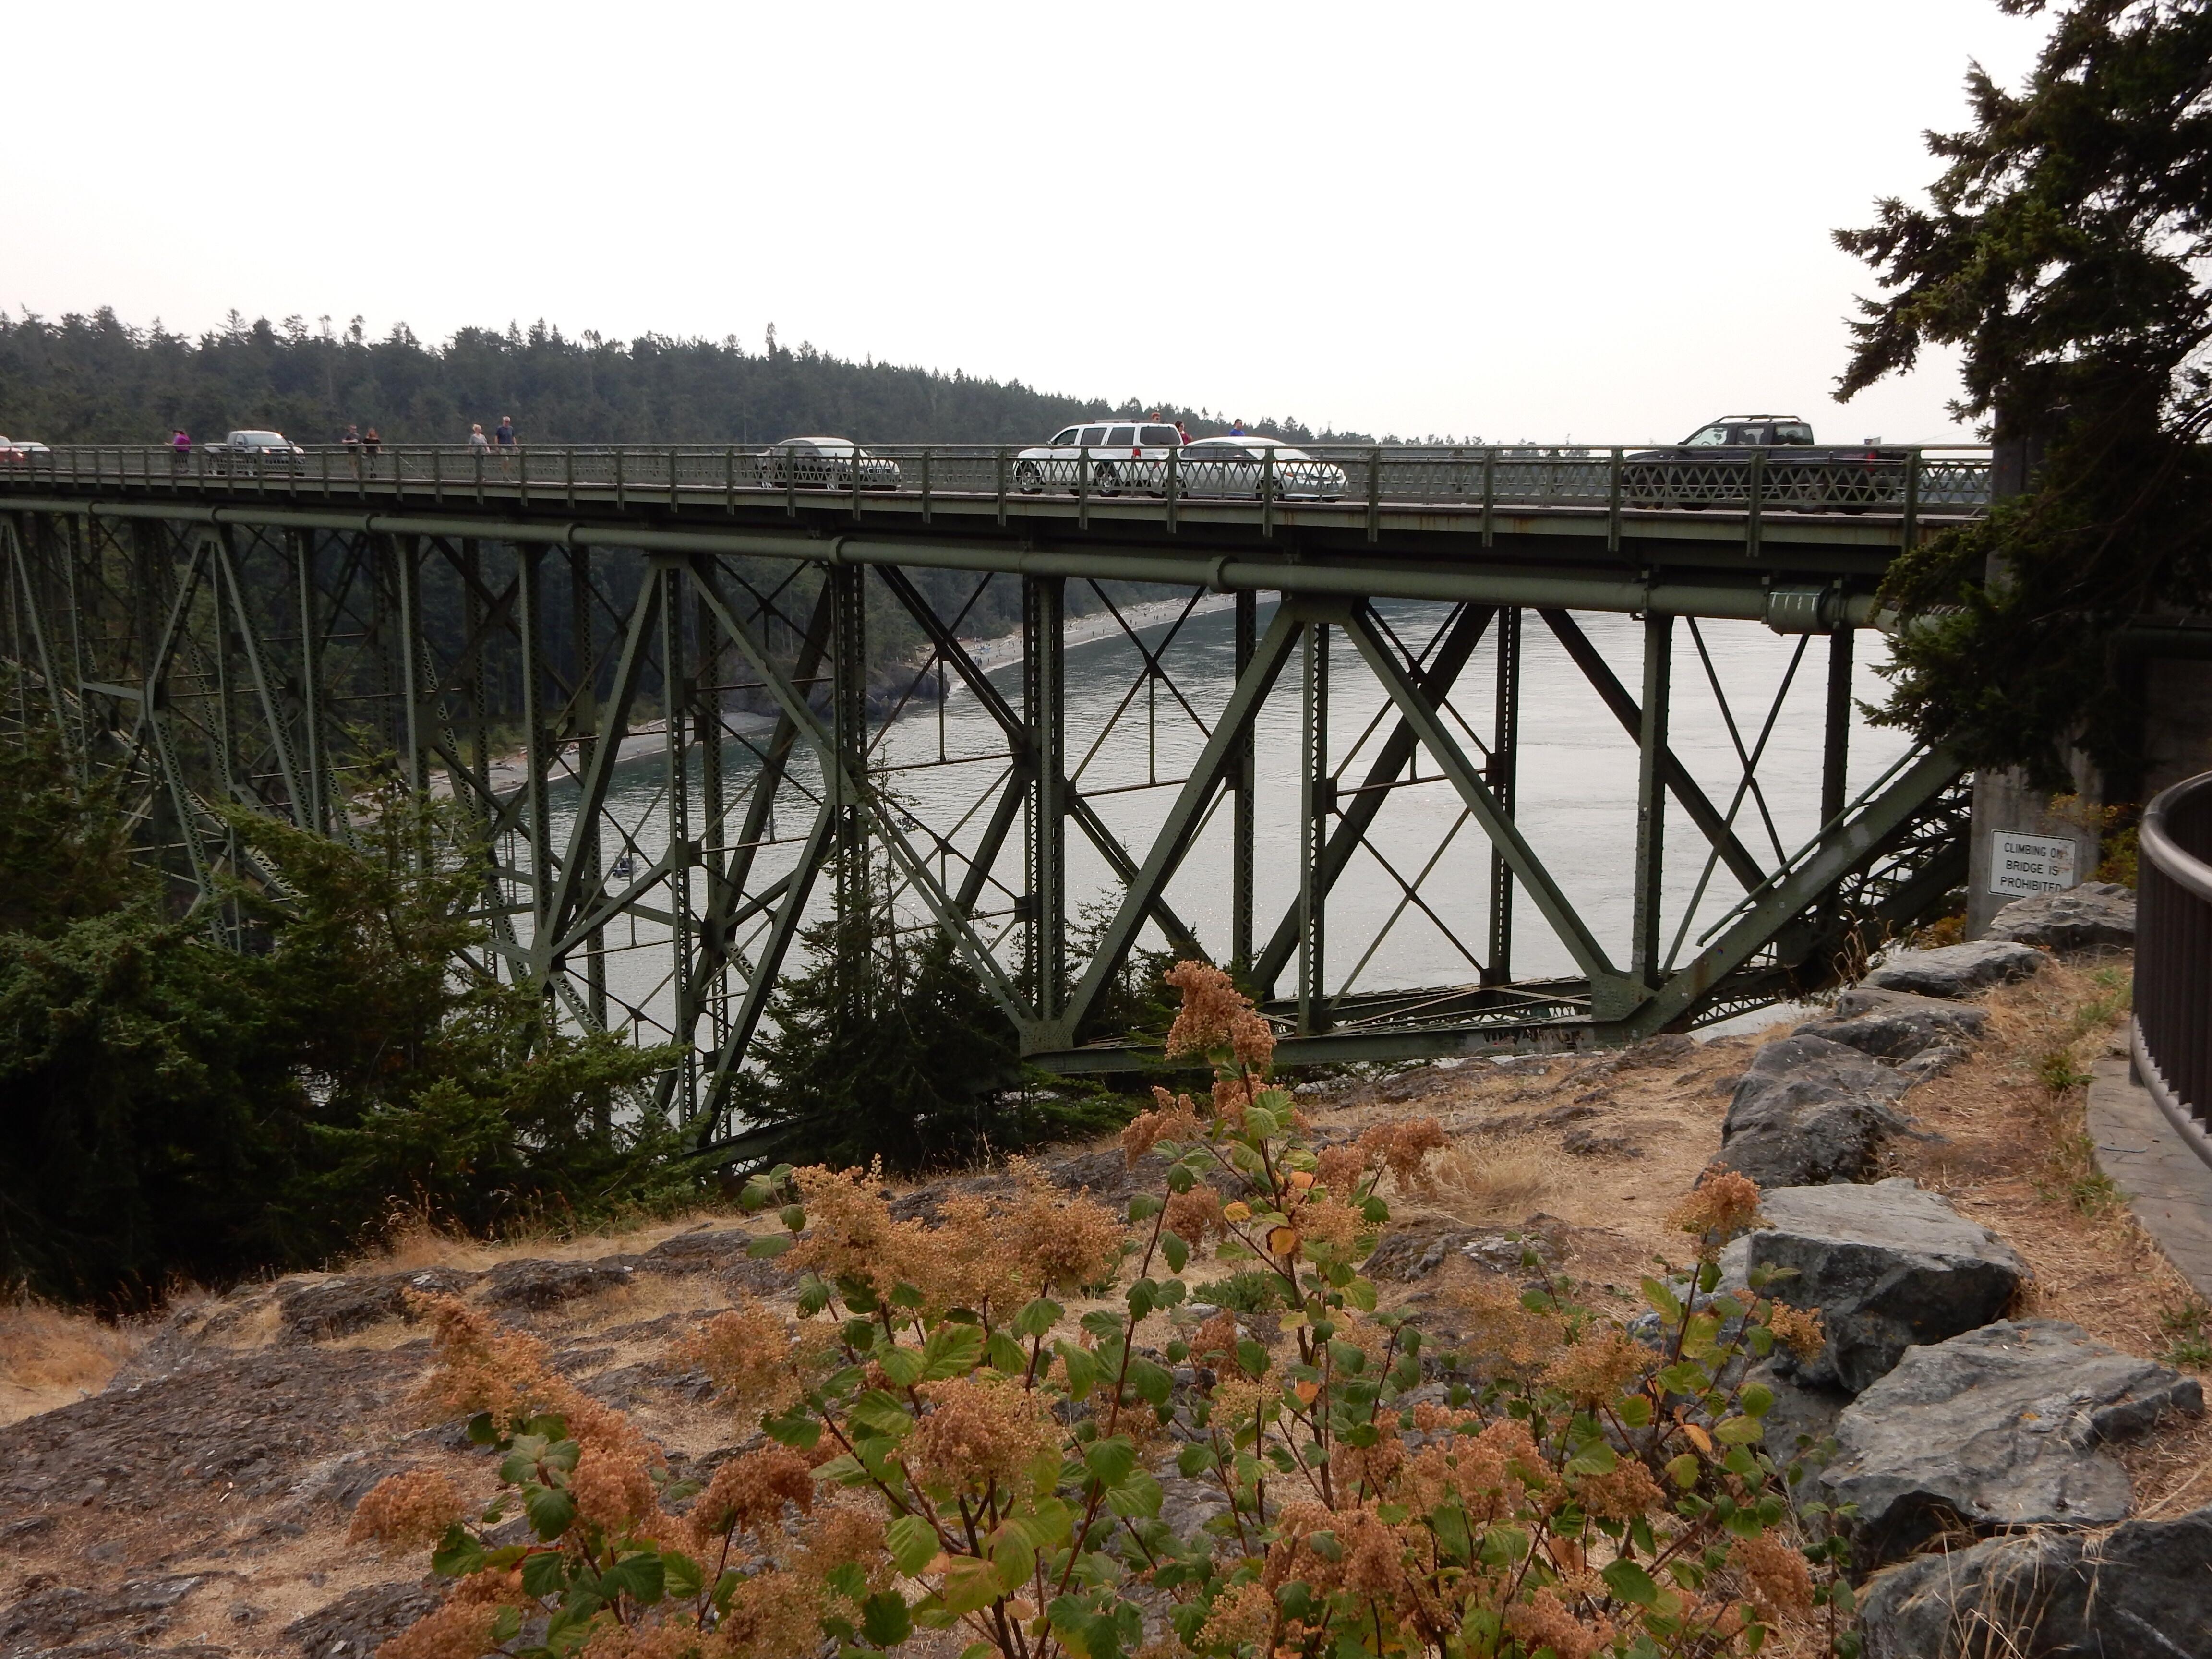 The Deception Pass bridge.